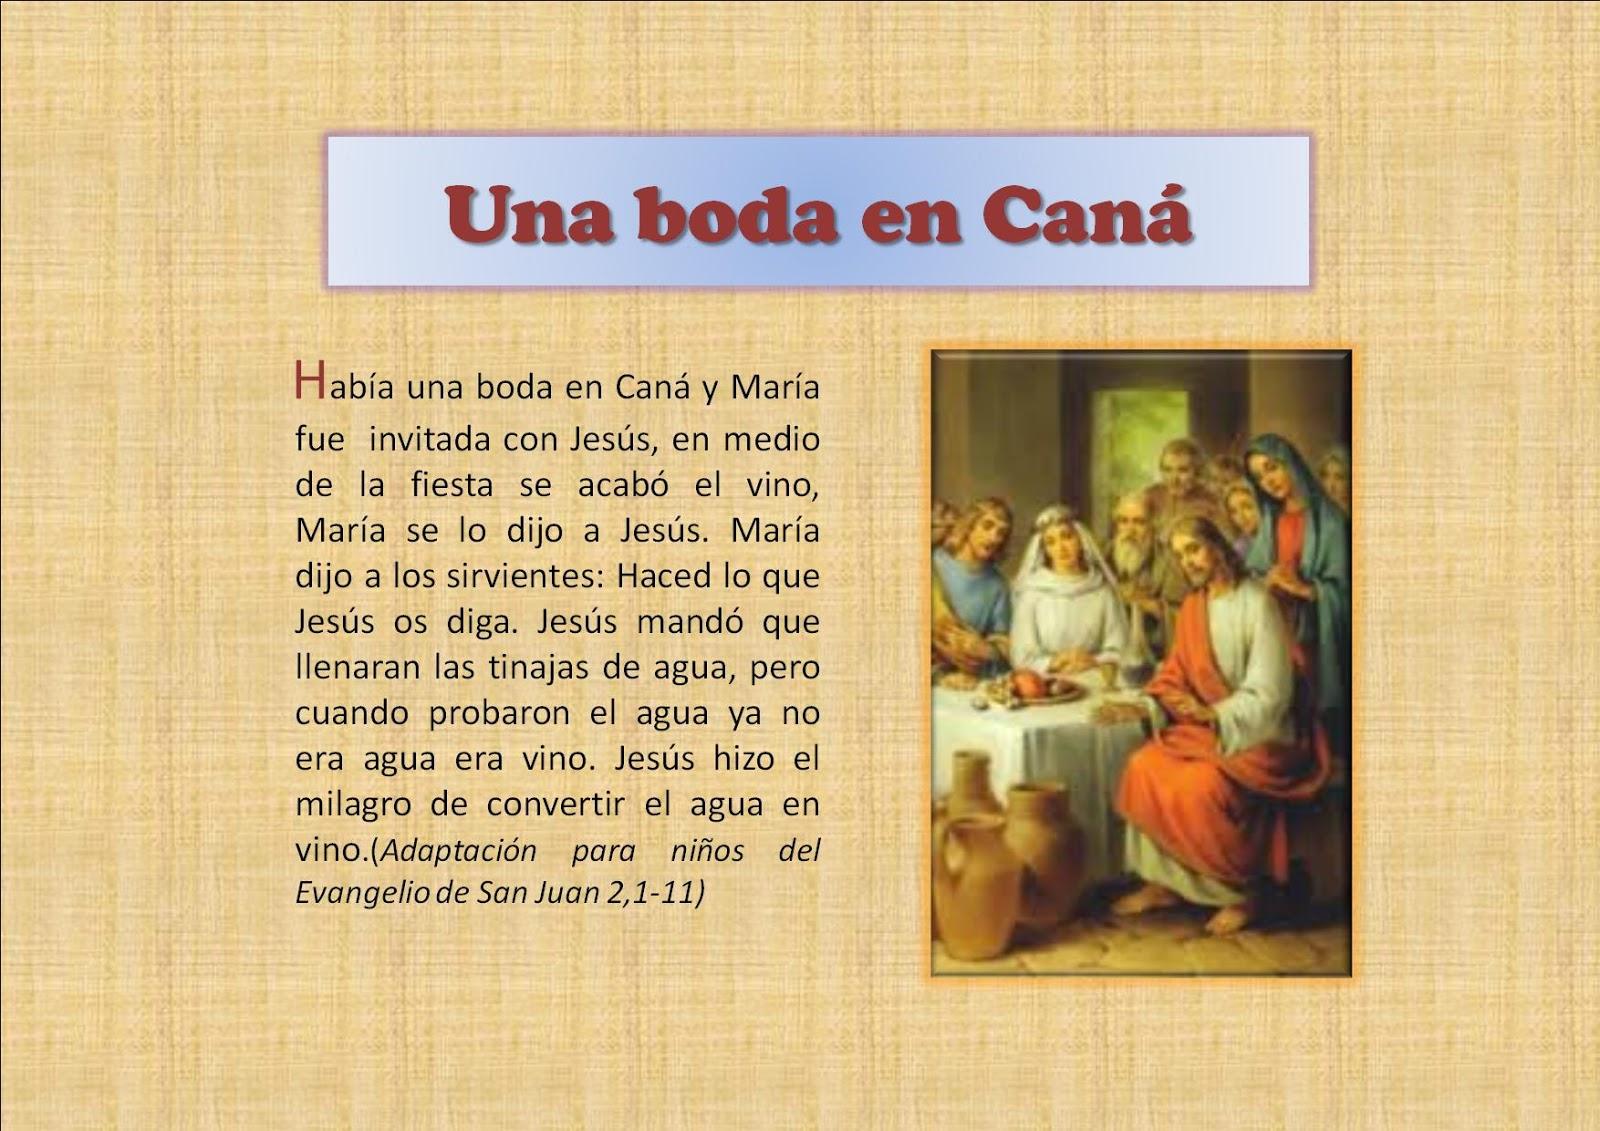 Matrimonio Segun La Biblia Catolica : Las bodas de canaan segun la biblia — cluber